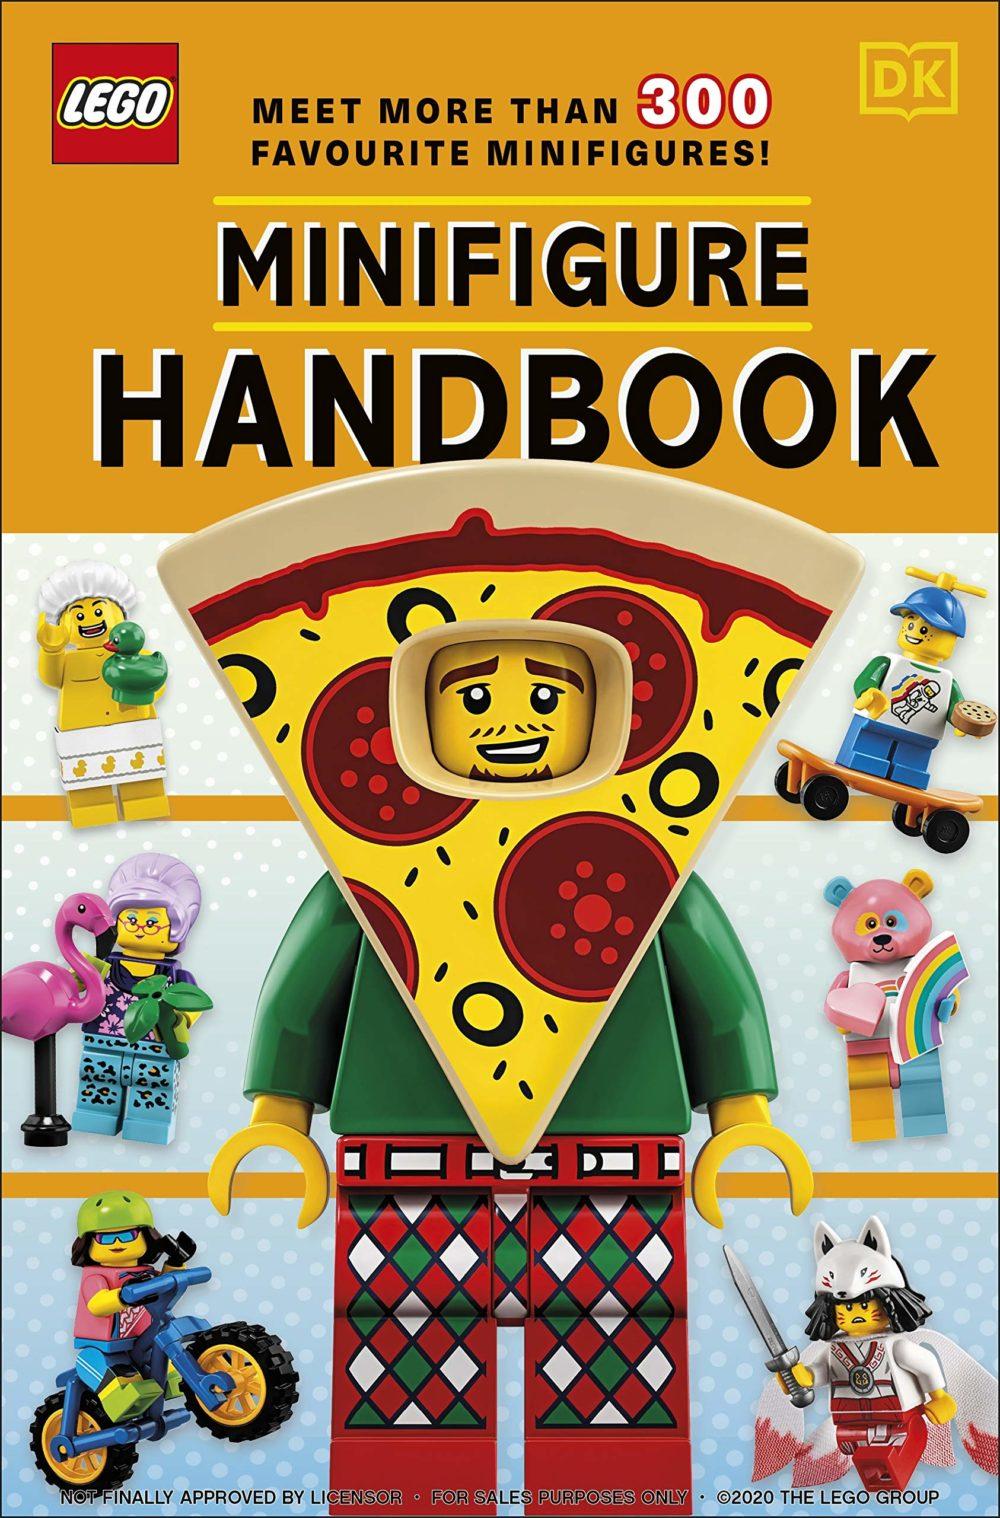 LEGO Minifigure Handbook